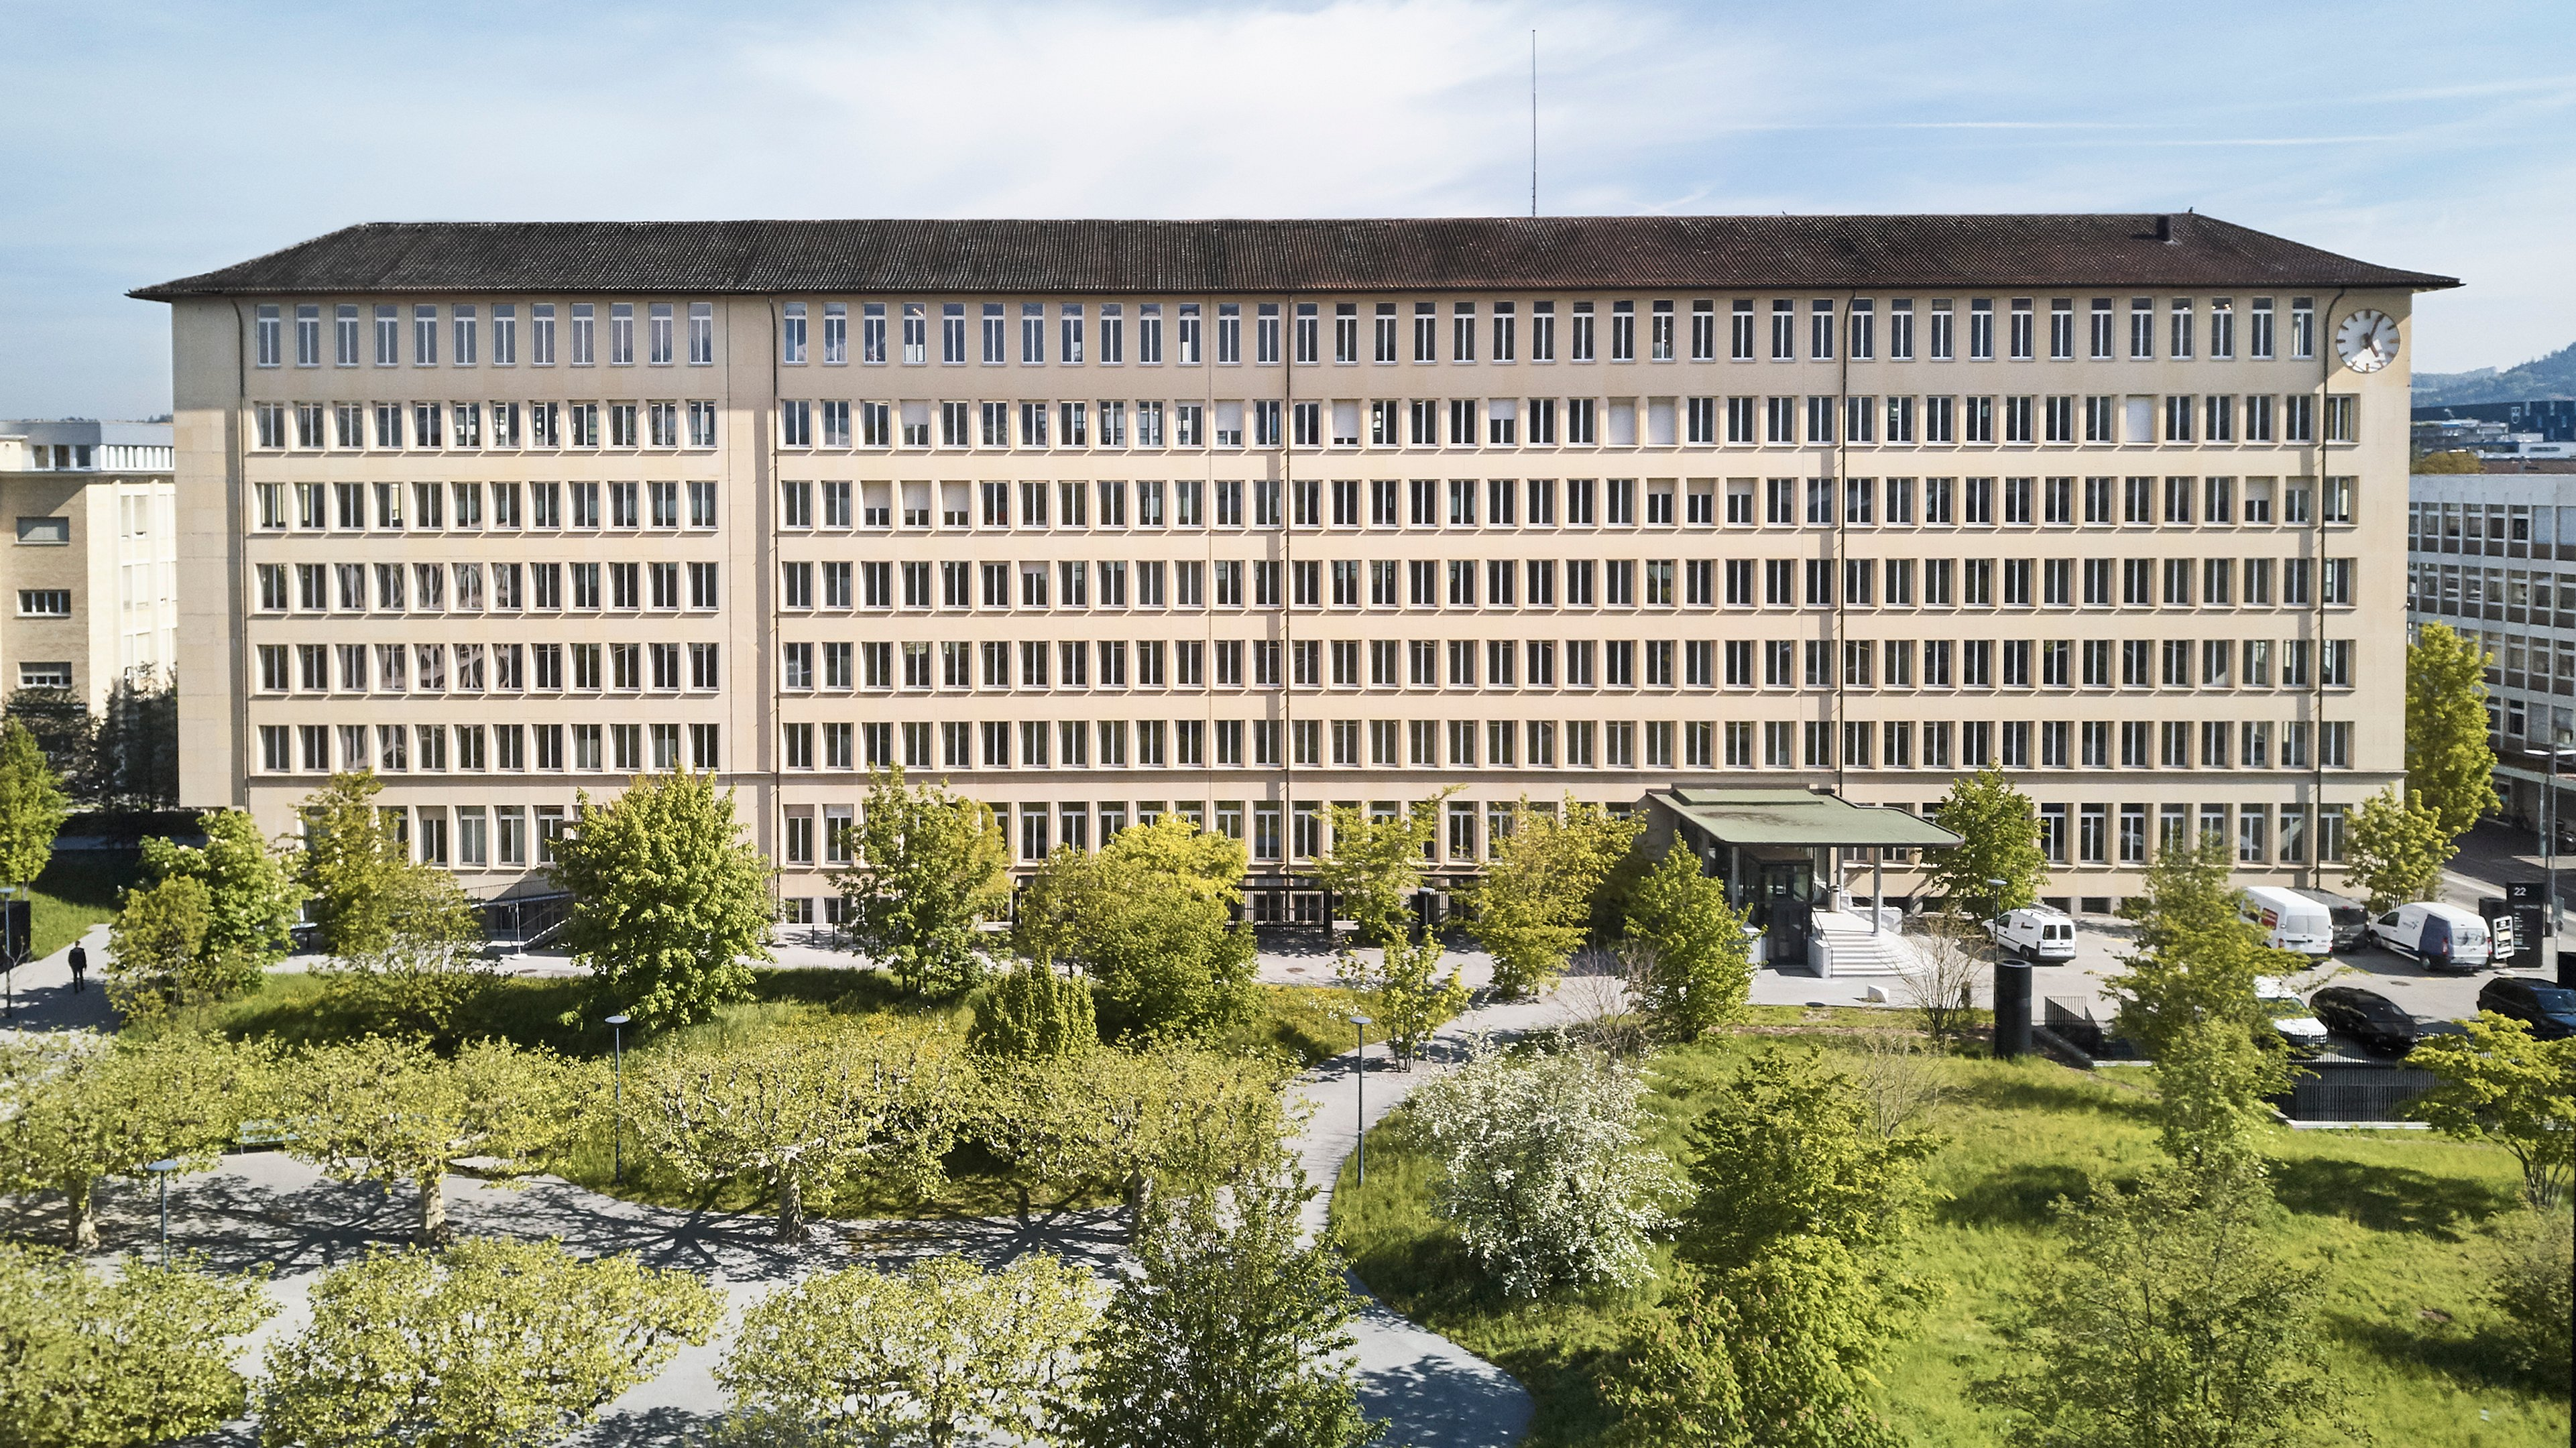 Stadtverwaltung Zug